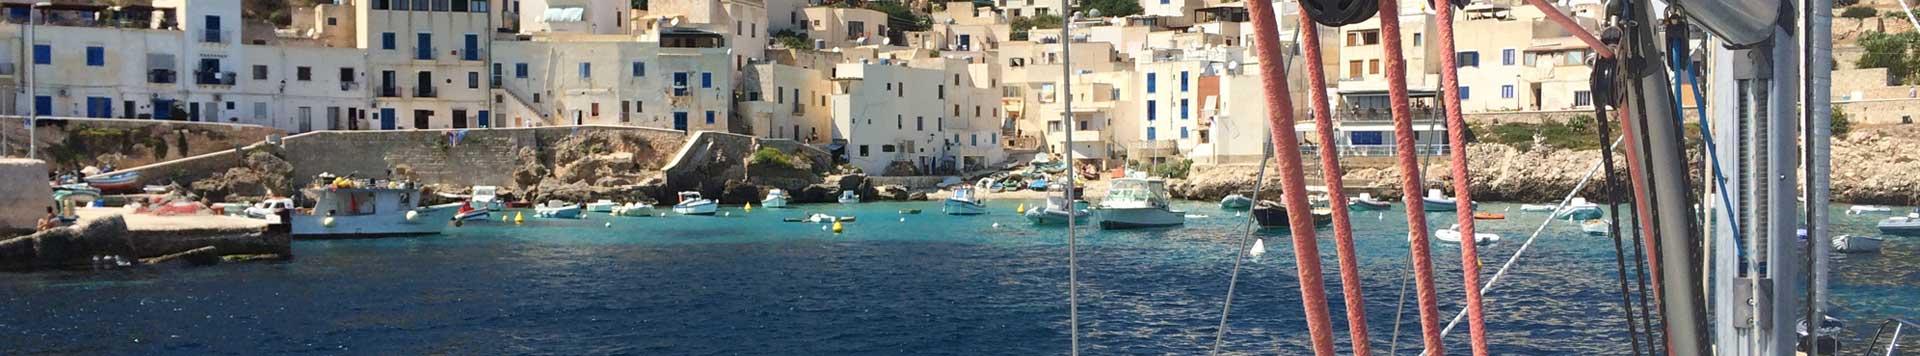 vacanza in barca a vela isole egadi